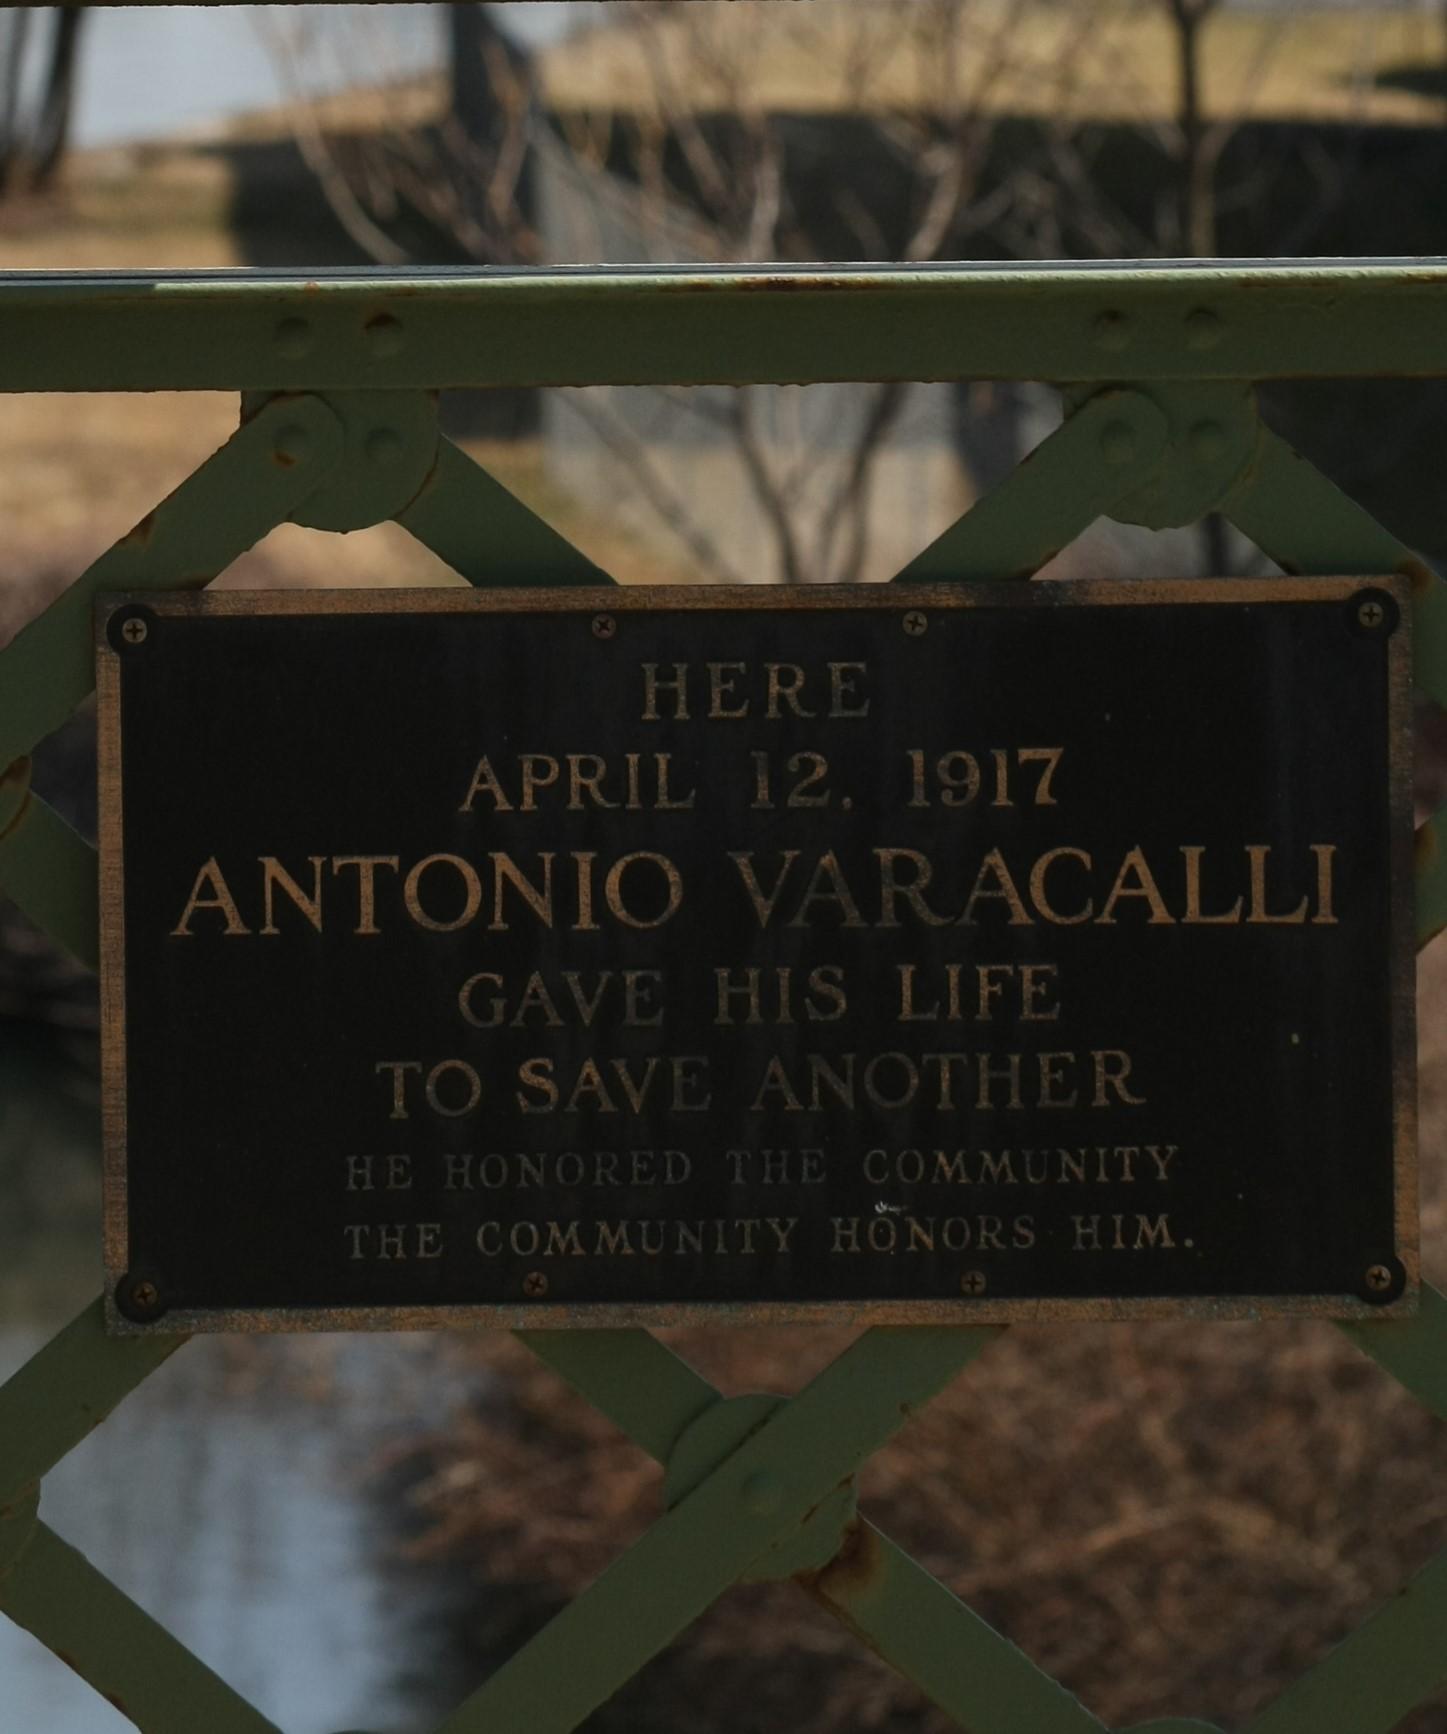 Antonio Varacalli's plaque on the Bridge St. bridge in Seneca Falls, NY. Courtesy of Spencer Tulis